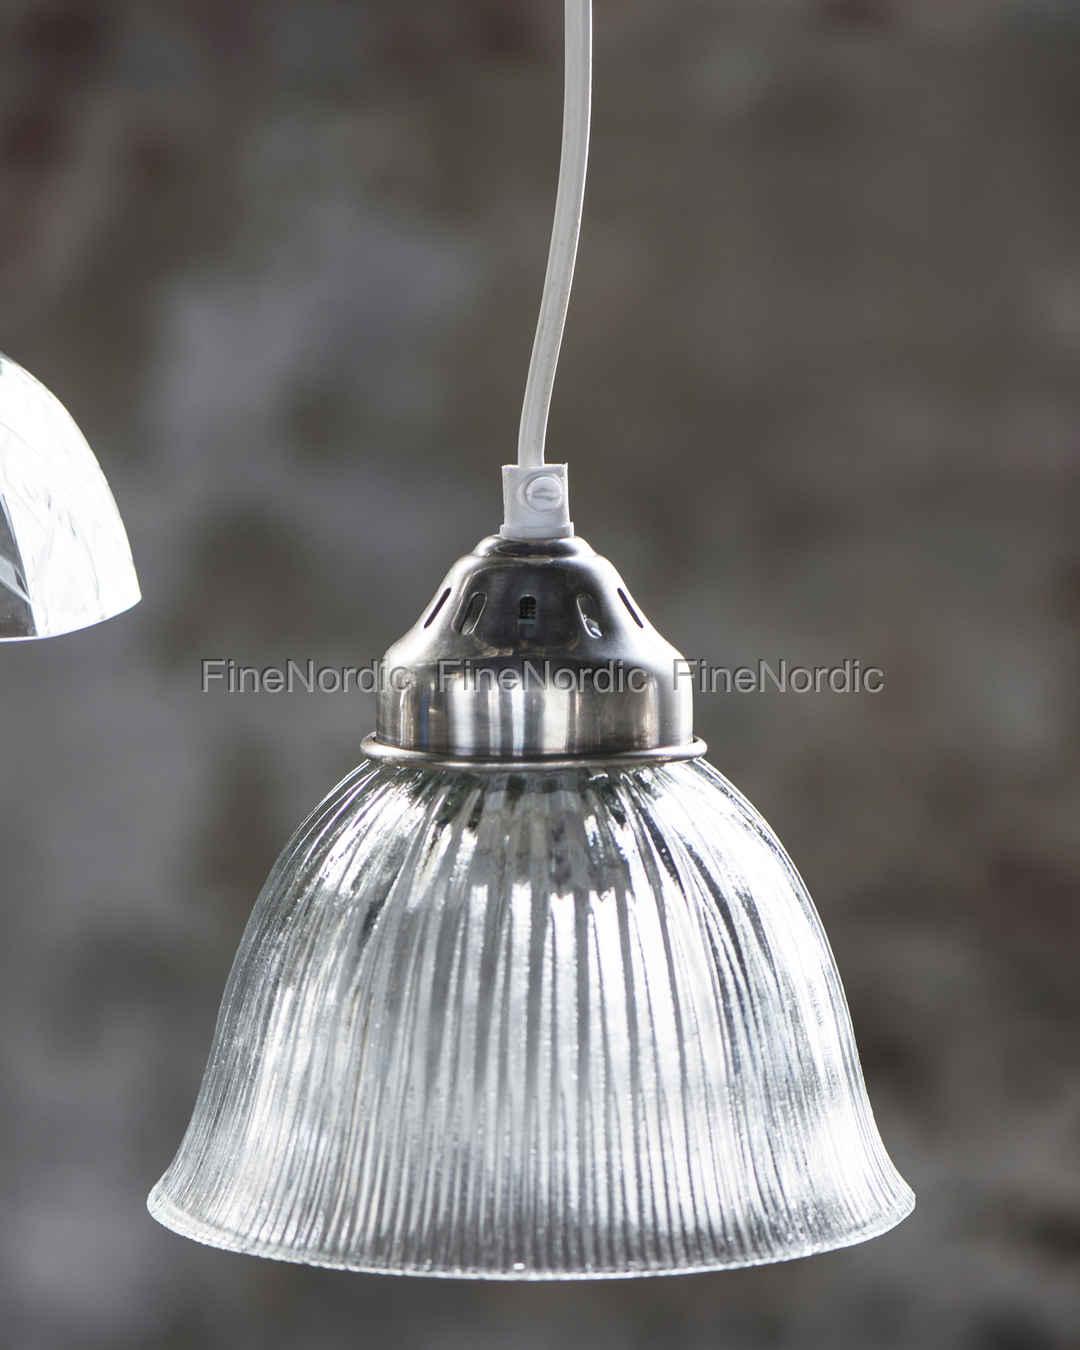 Avanceret Ib Laursen Lampe Glasschirm mit Breite Rillen SP64